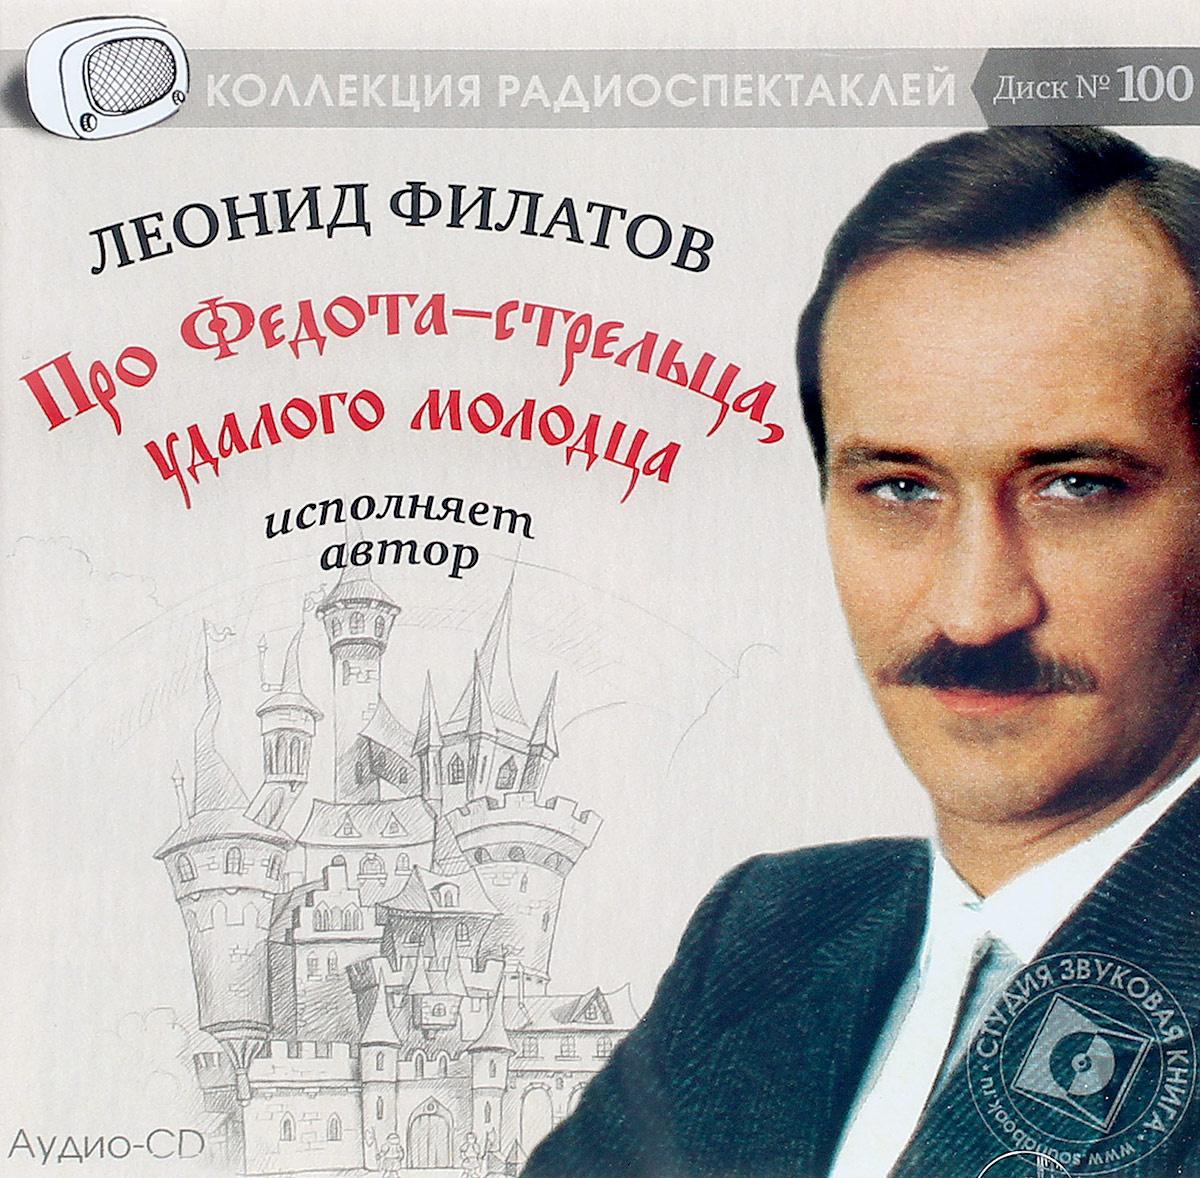 Про Федота-стрельца, удалого молодца (аудиокнига CD) | Филатов Леонид Алексеевич  #1